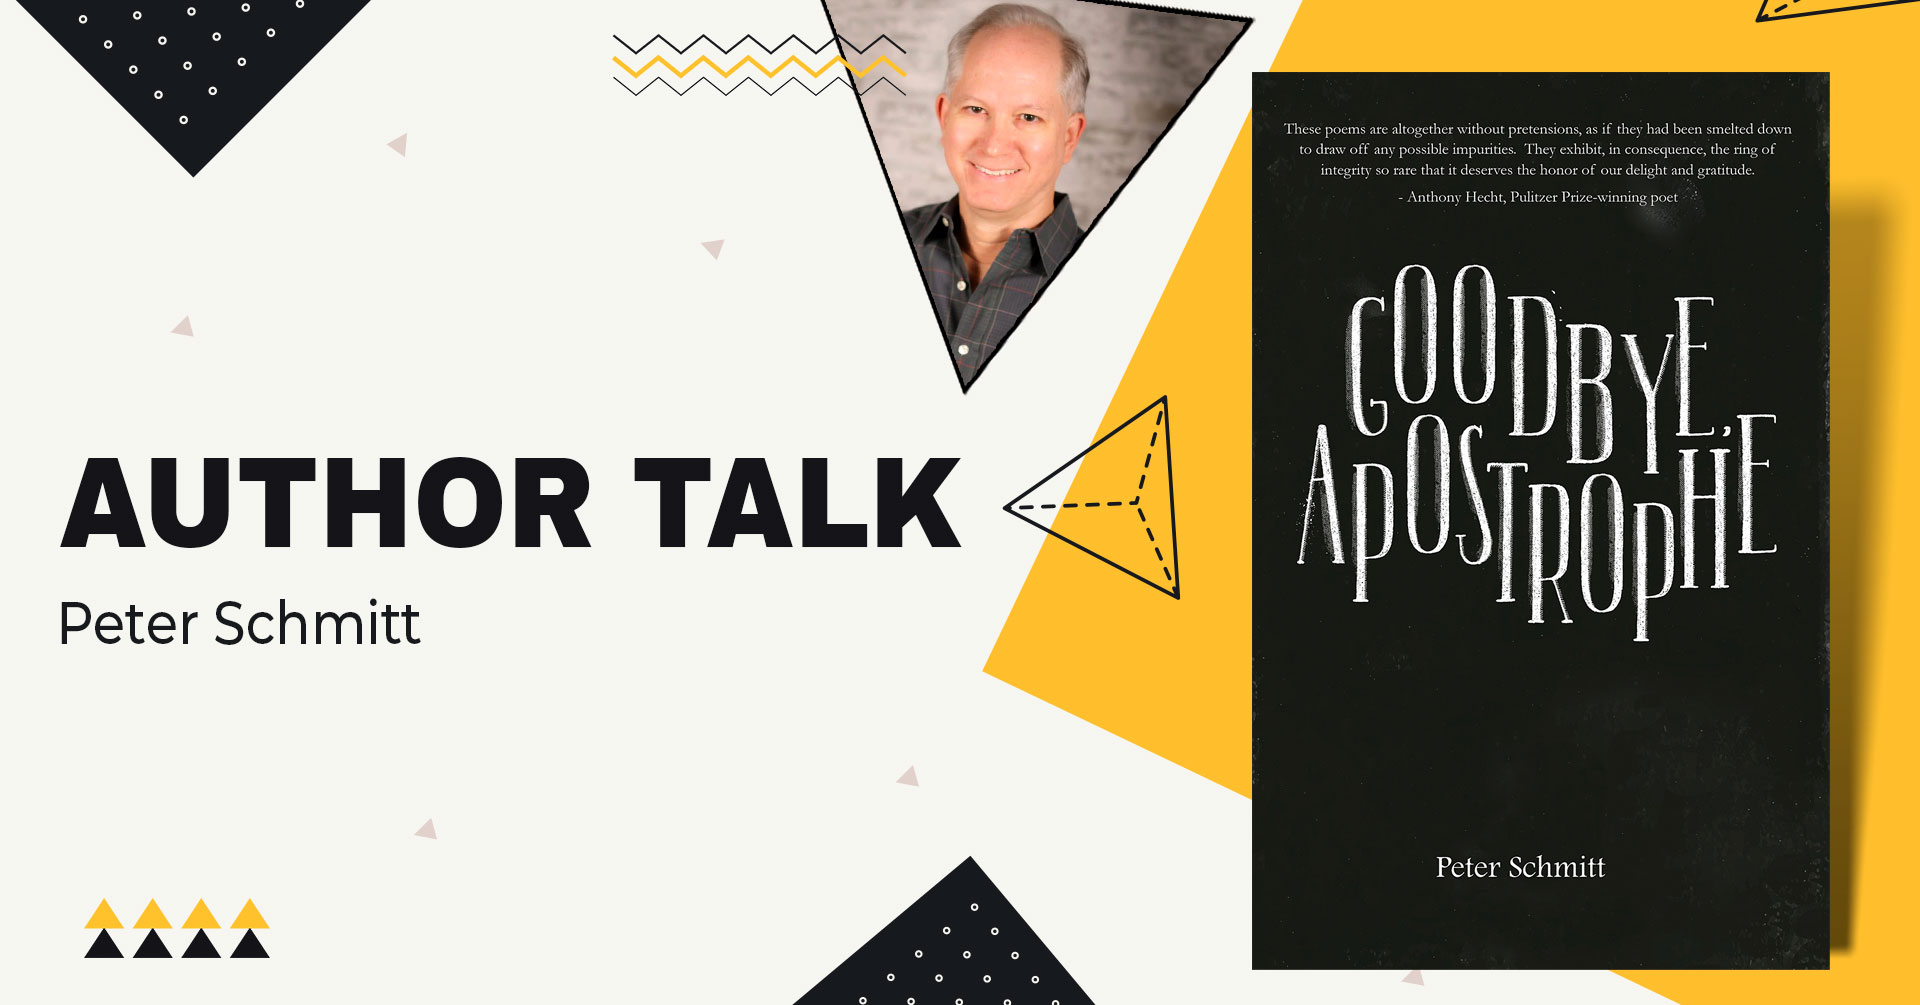 author talk peter schmitt goodbye apostrophe